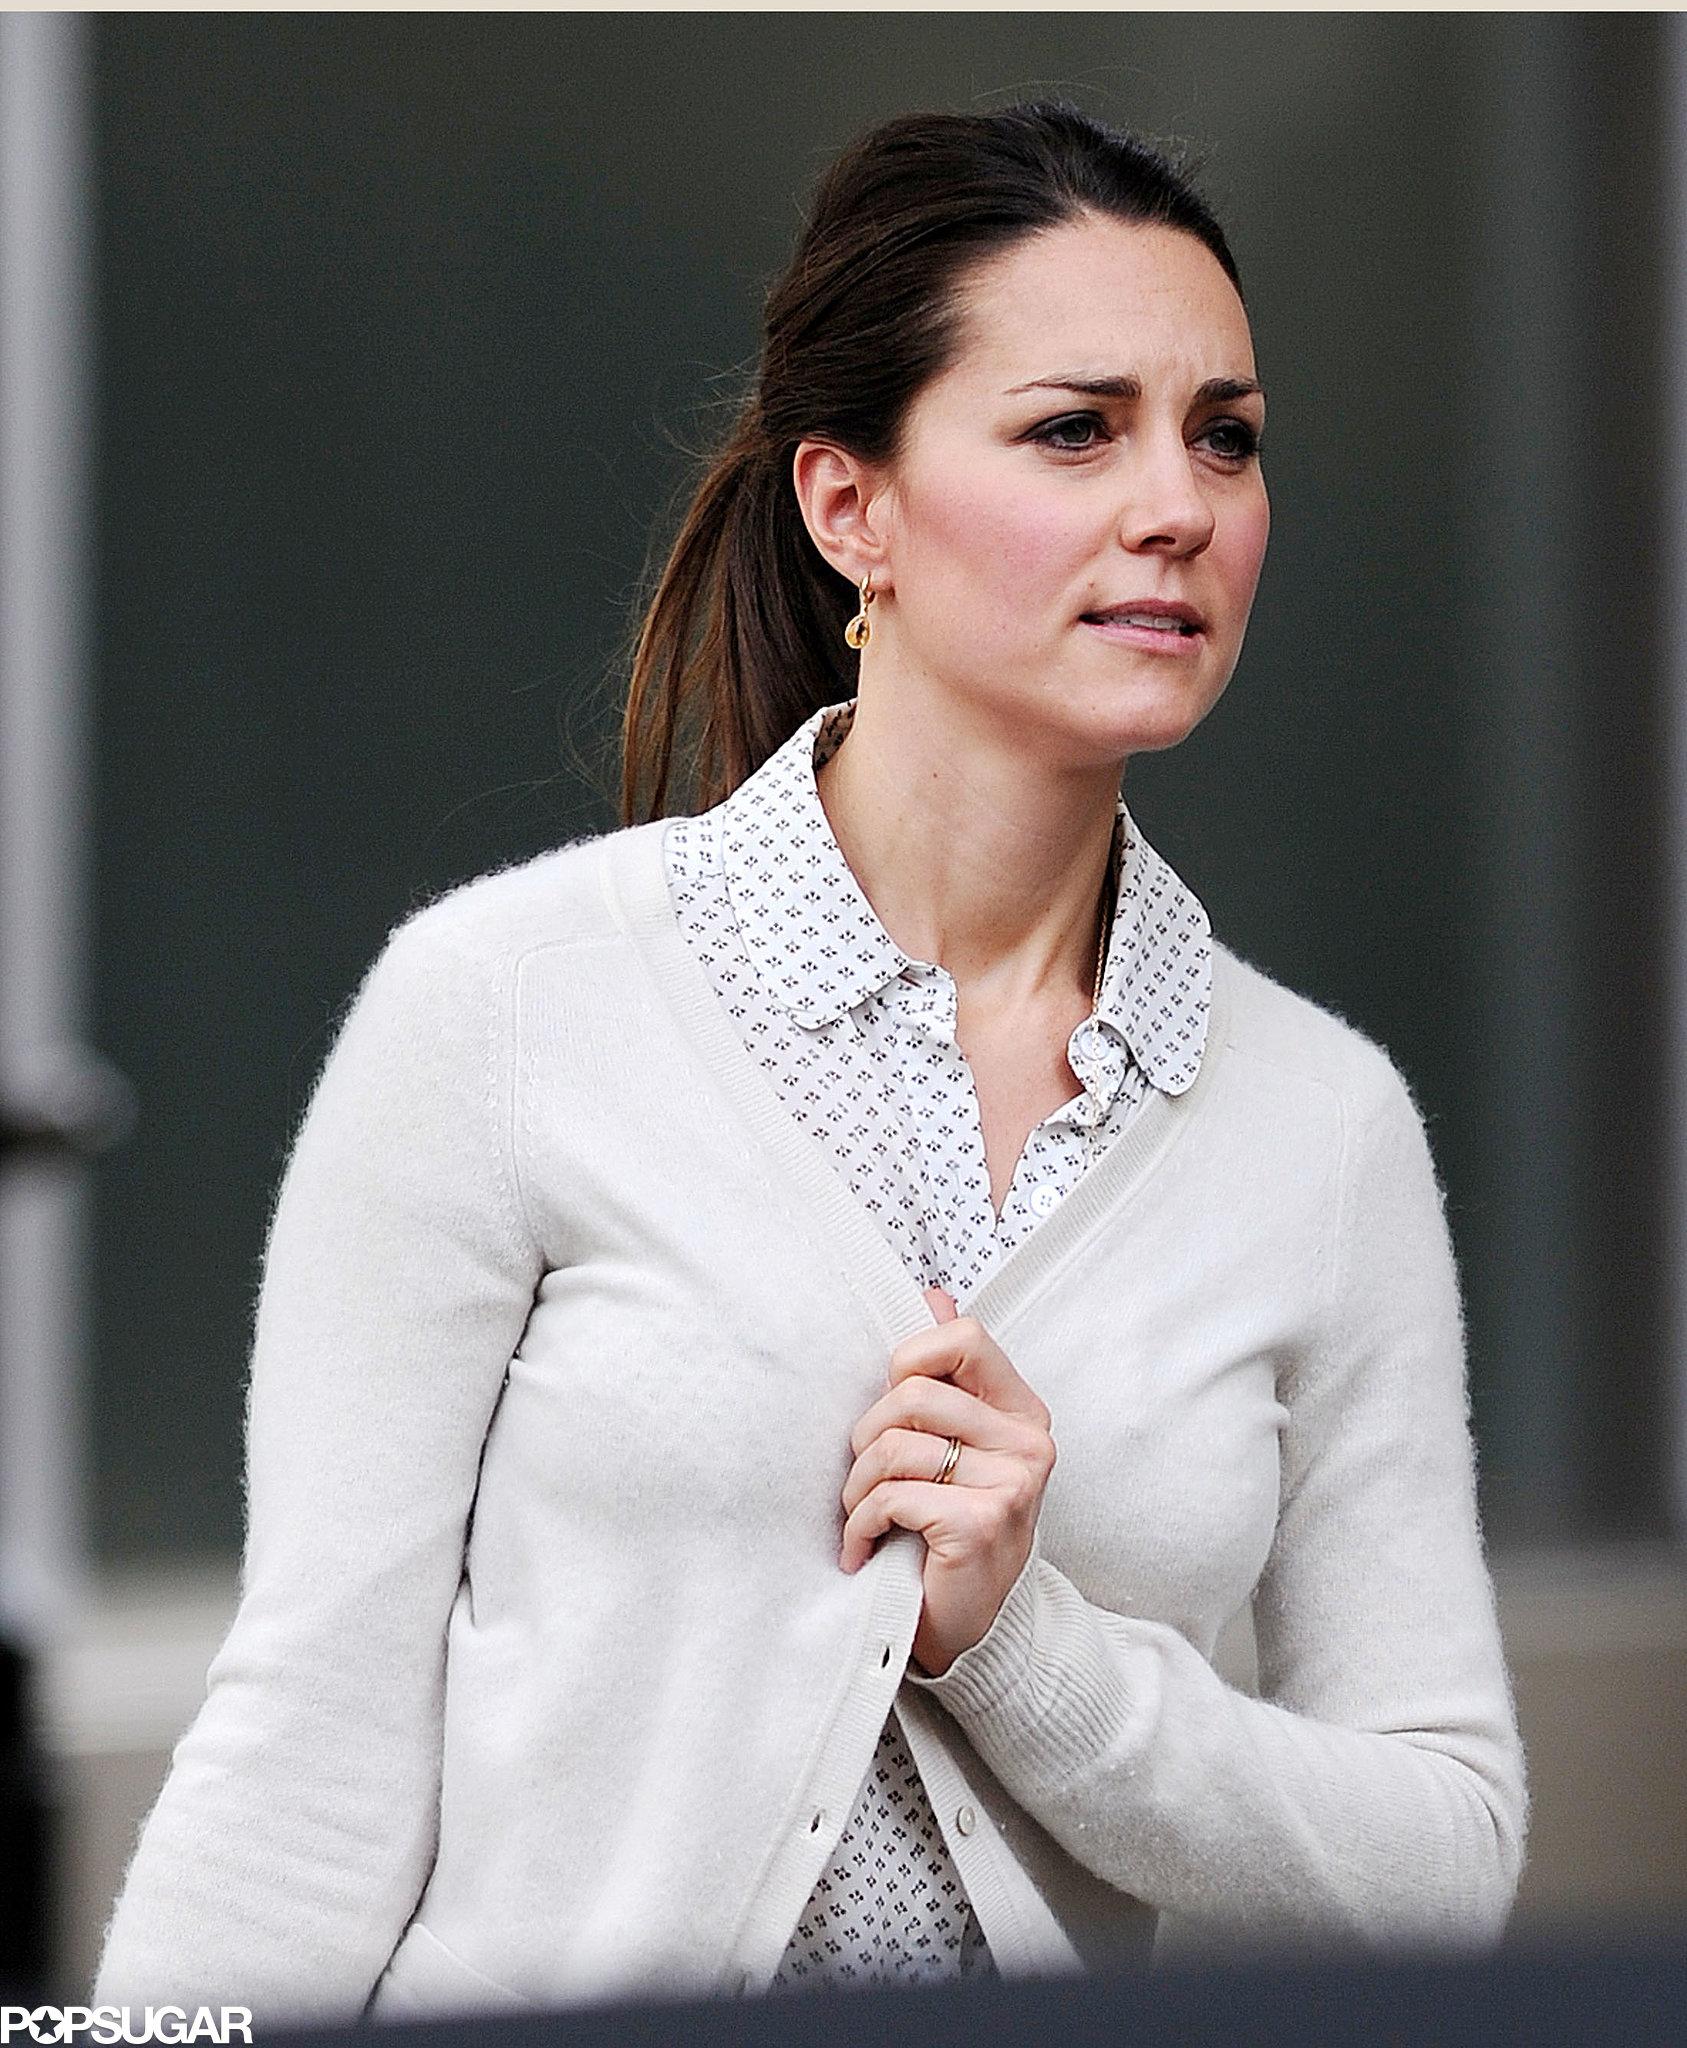 Kate Middleton Bargain Shops in Sneakers!